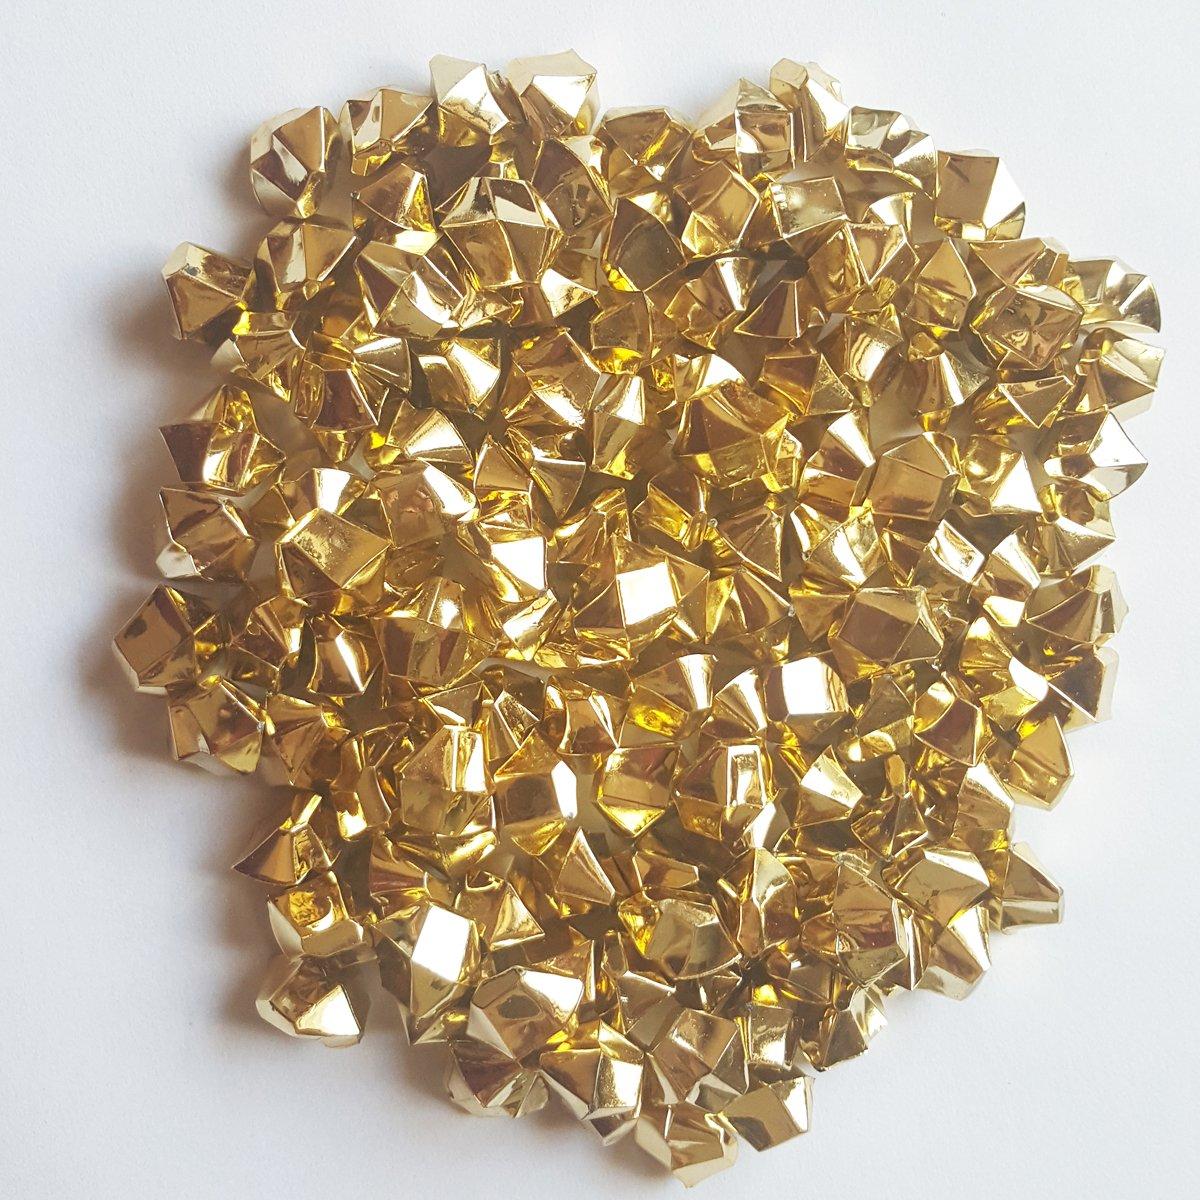 ElE&GANT 1LB(Approx 755Pcs) Plastic Metallic Gold Nuggets Table Scatter Decoration Vase Filler (Metallic Golden)